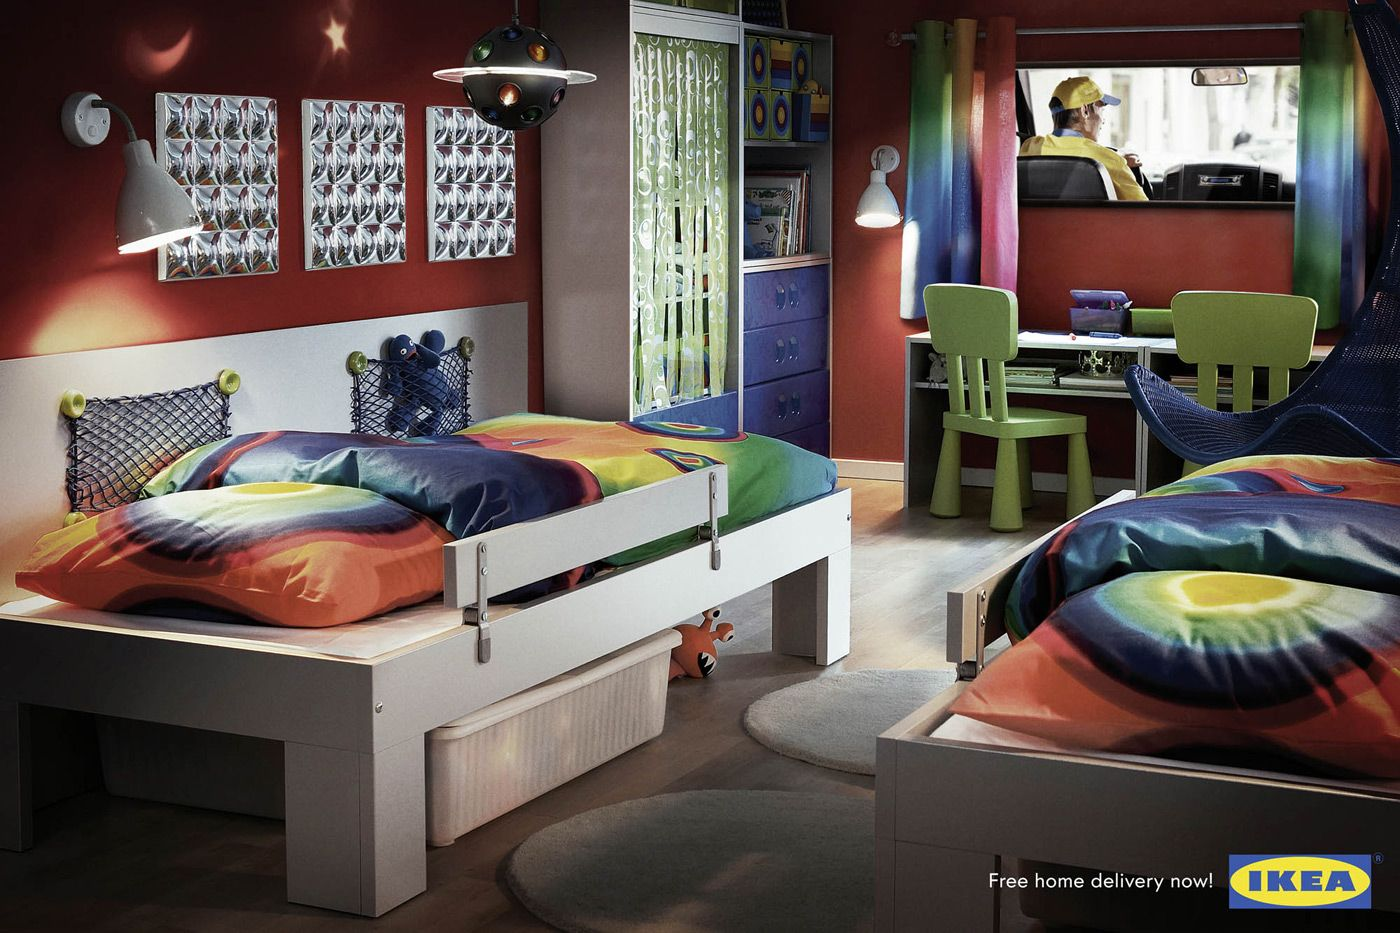 cool idea for illusion mural love the bedside storage idea ikea shared kids room - Ikea Shared Kids Room